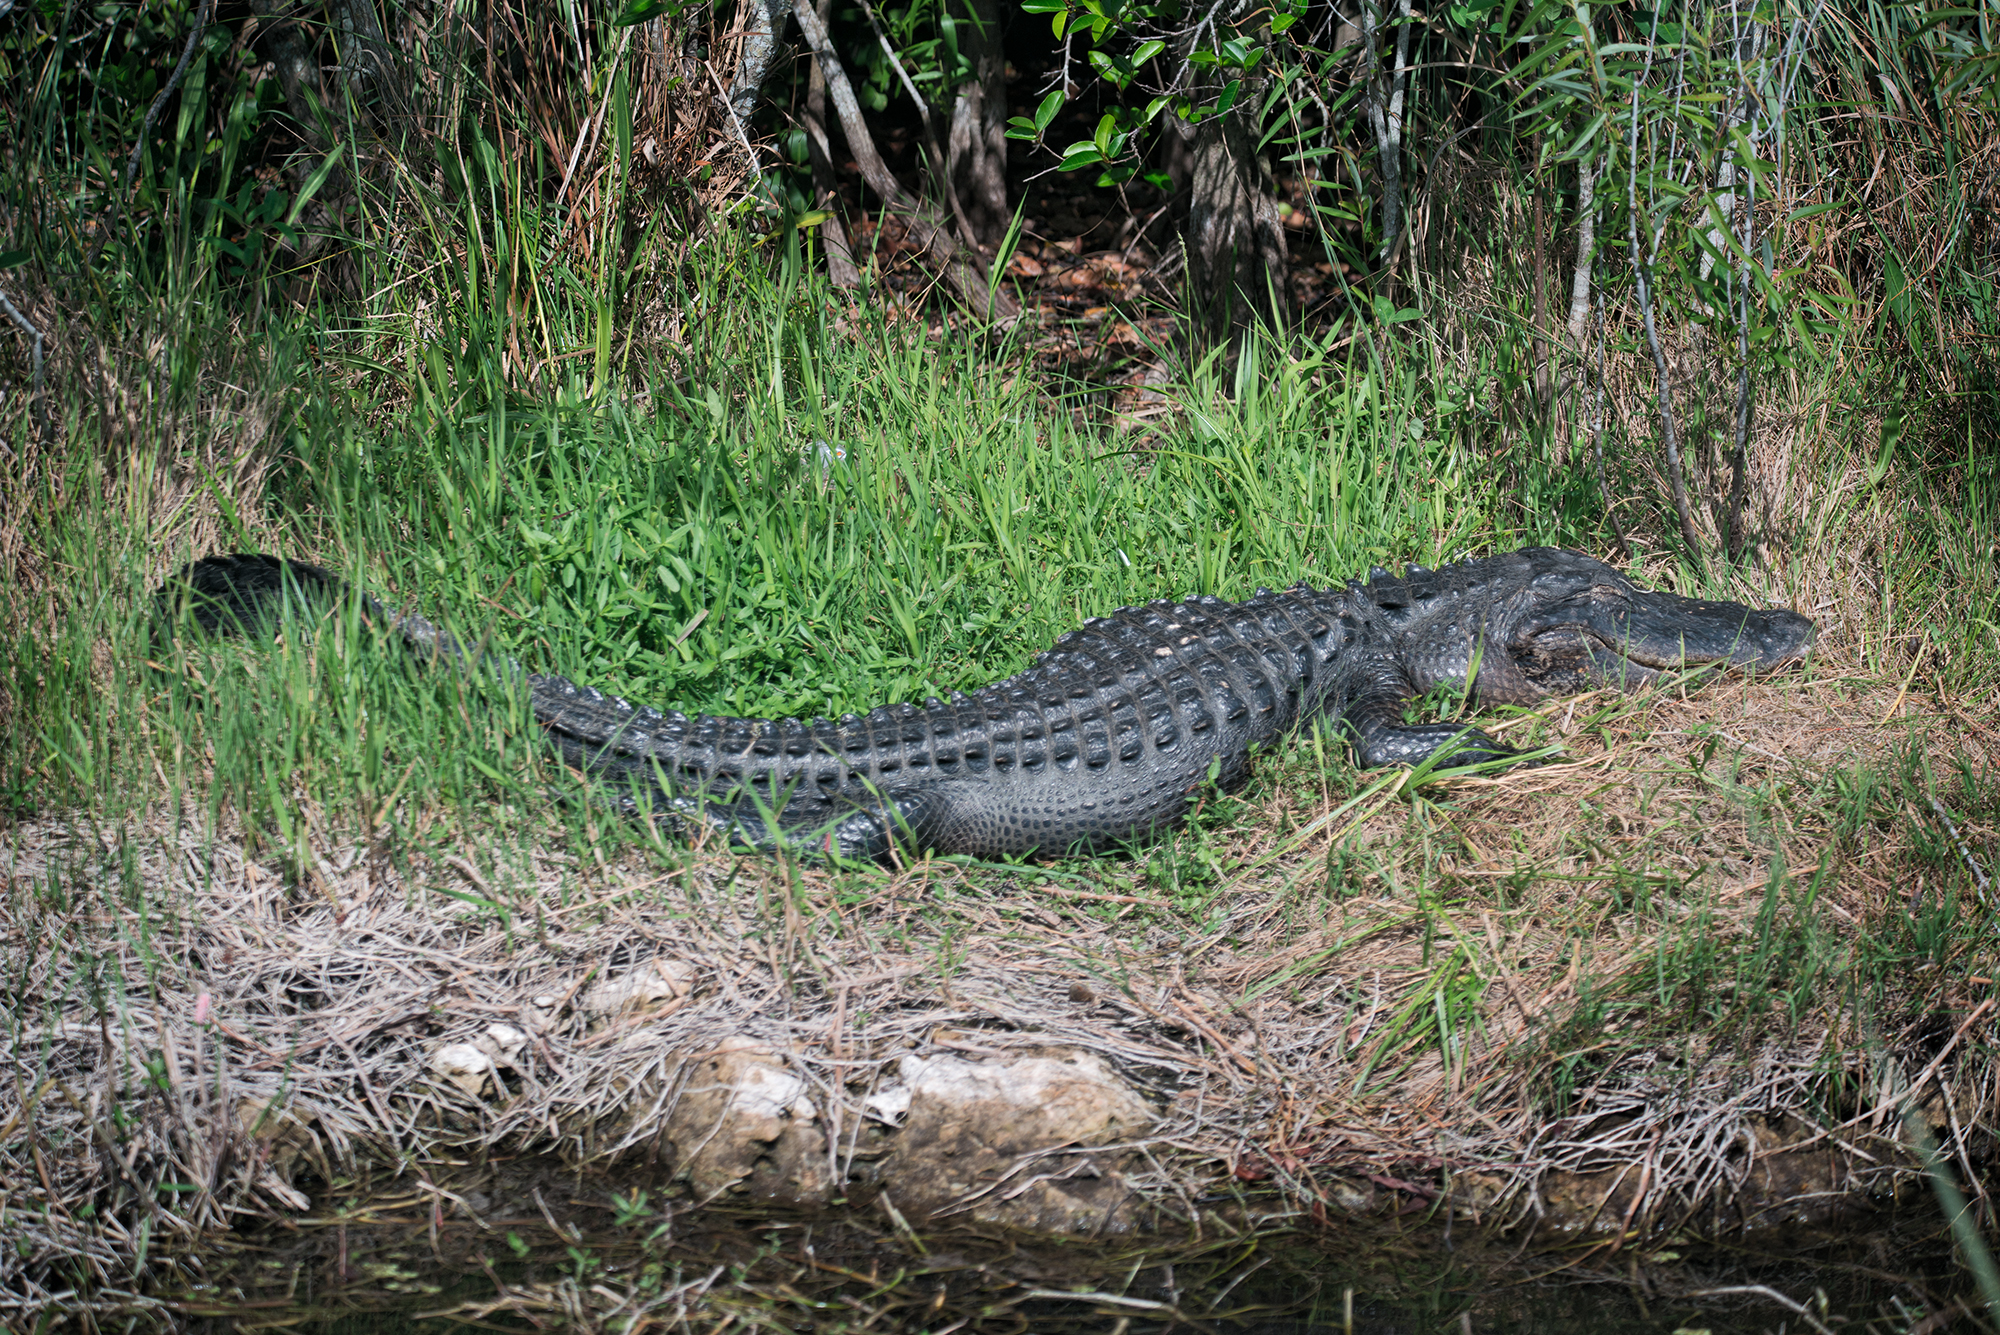 #alligator, #sleeping, #wildlife, #nature, #everglades, #sharkvalley